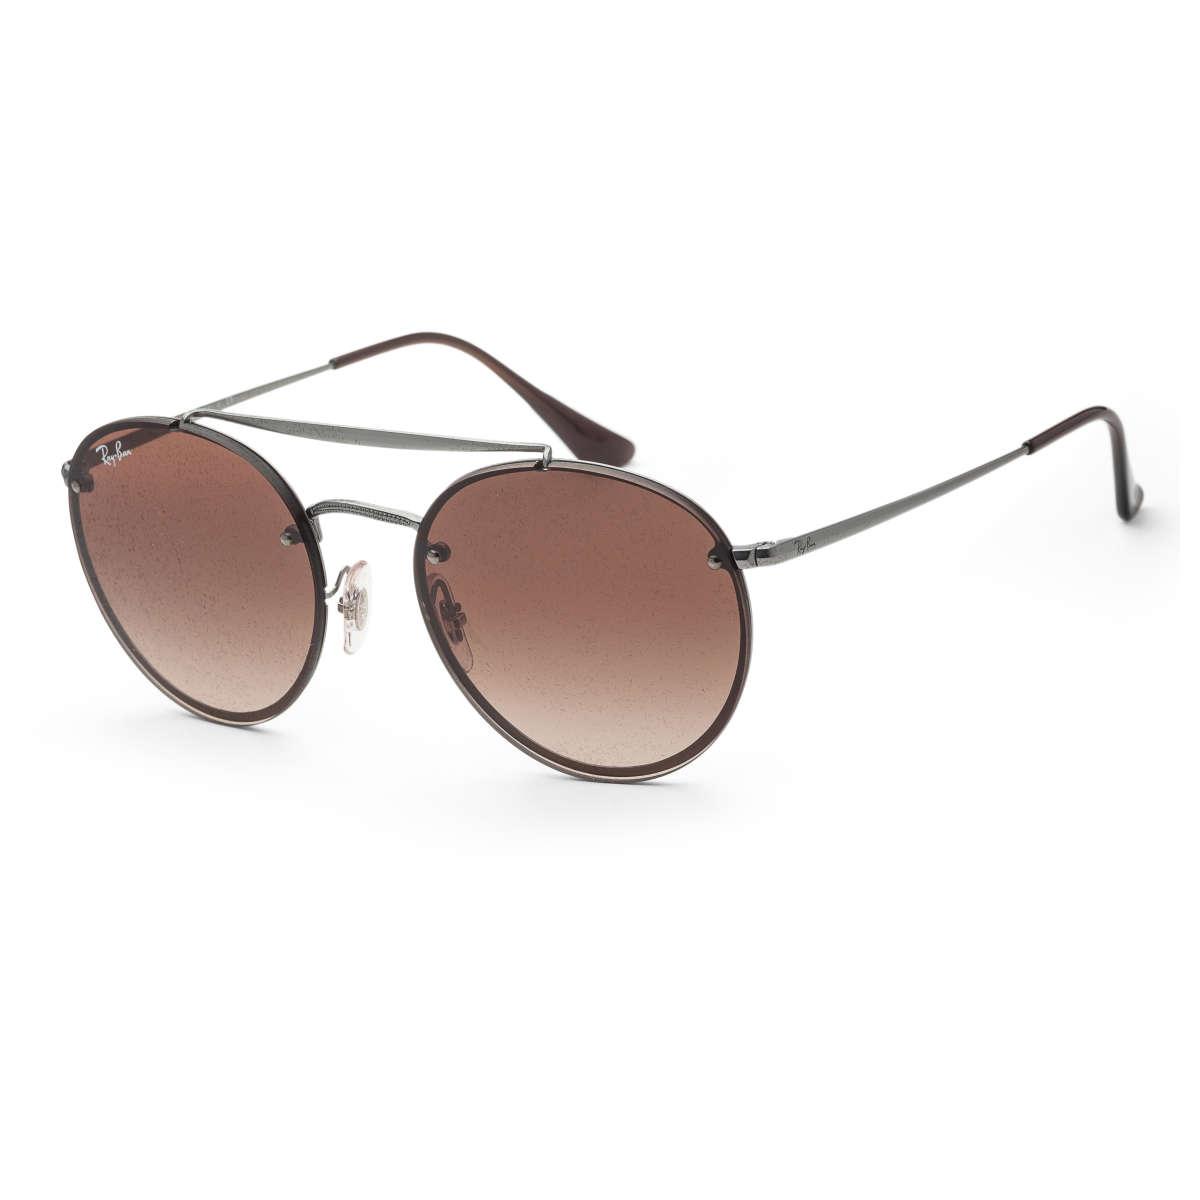 Ray-Ban 54mm UV Protection Round Men's Aviator Sunglasses